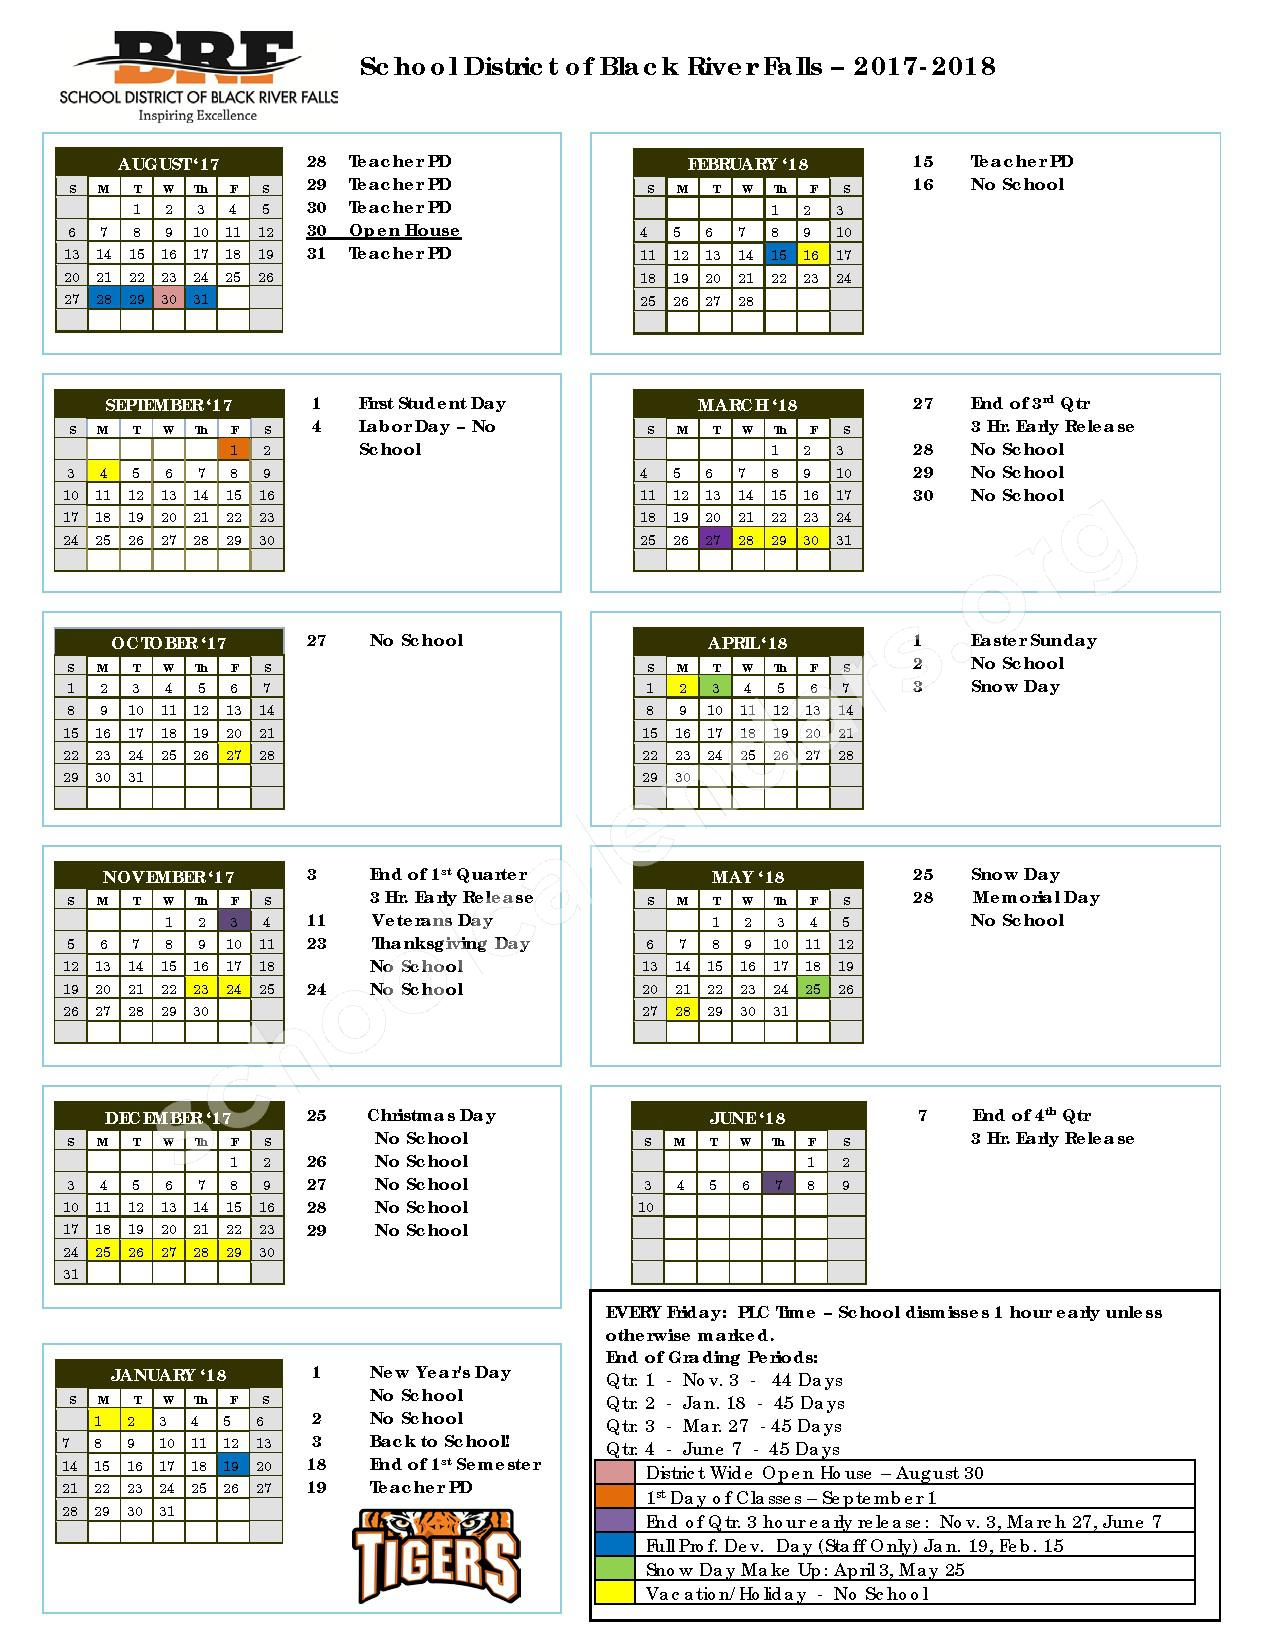 2017 - 2018 School Calendar – Black River Falls School District – page 1